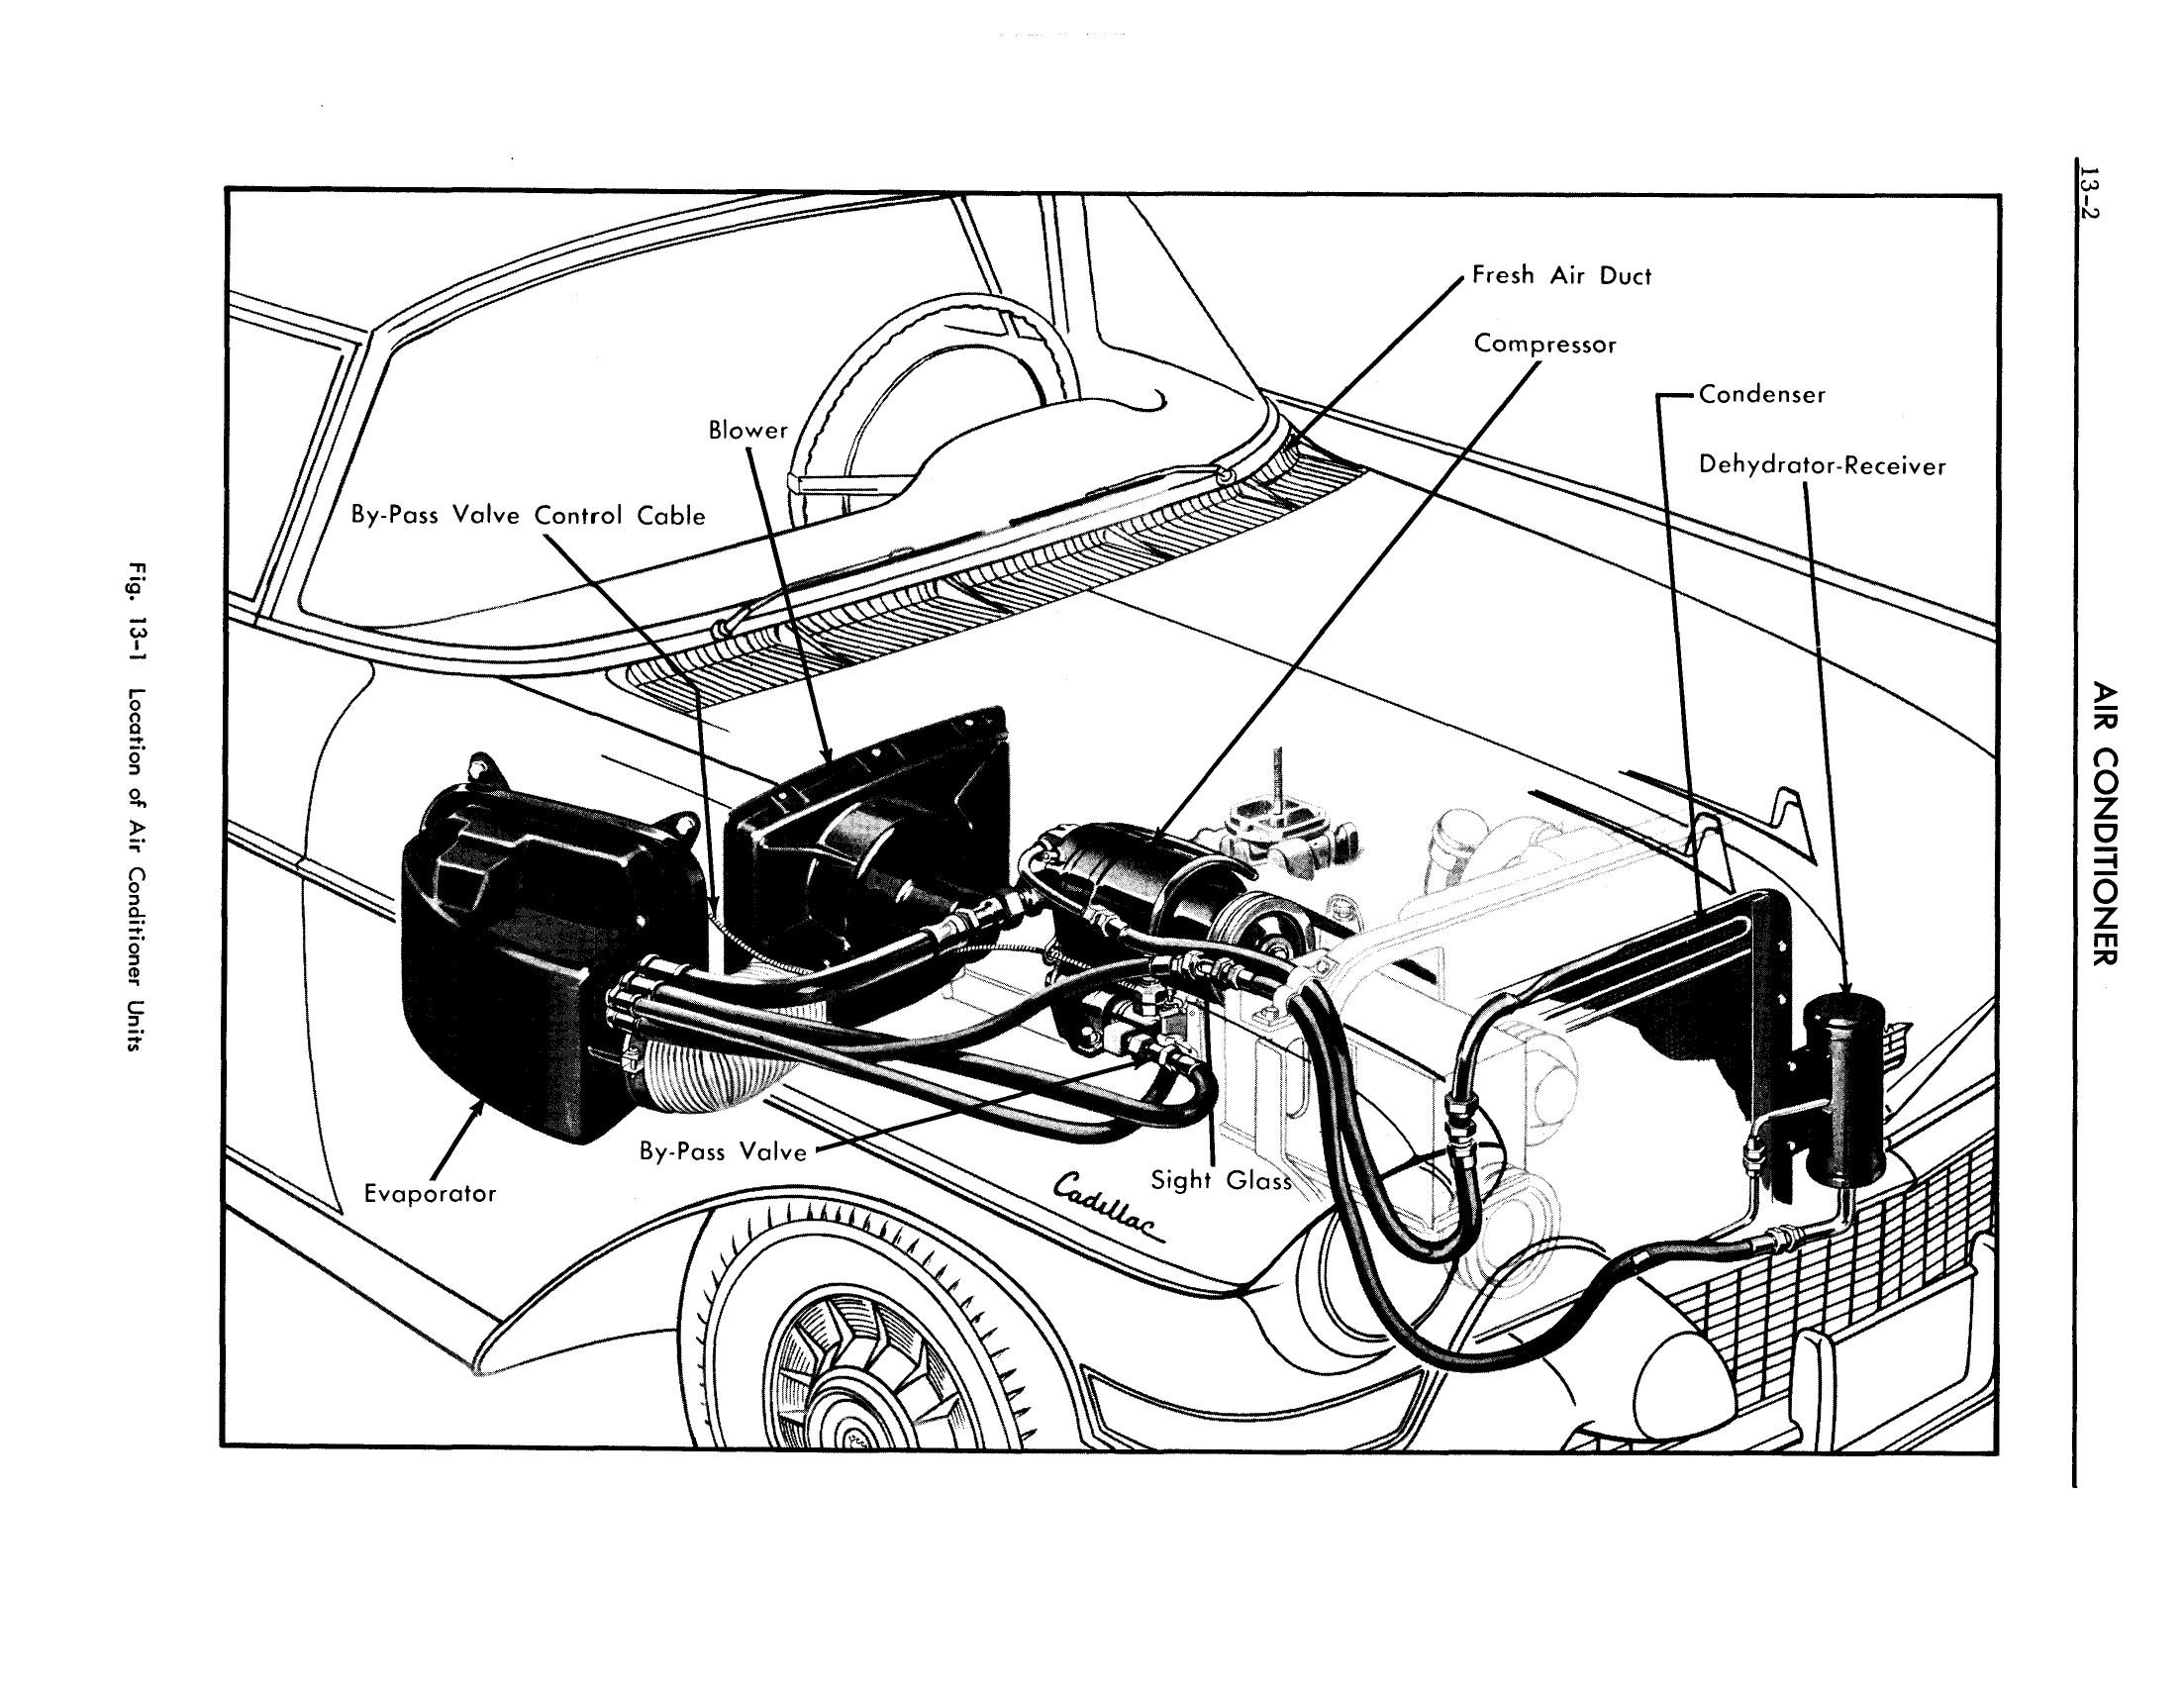 1957 Cadillac Shop Manual- Air Conditioner Page 2 of 22